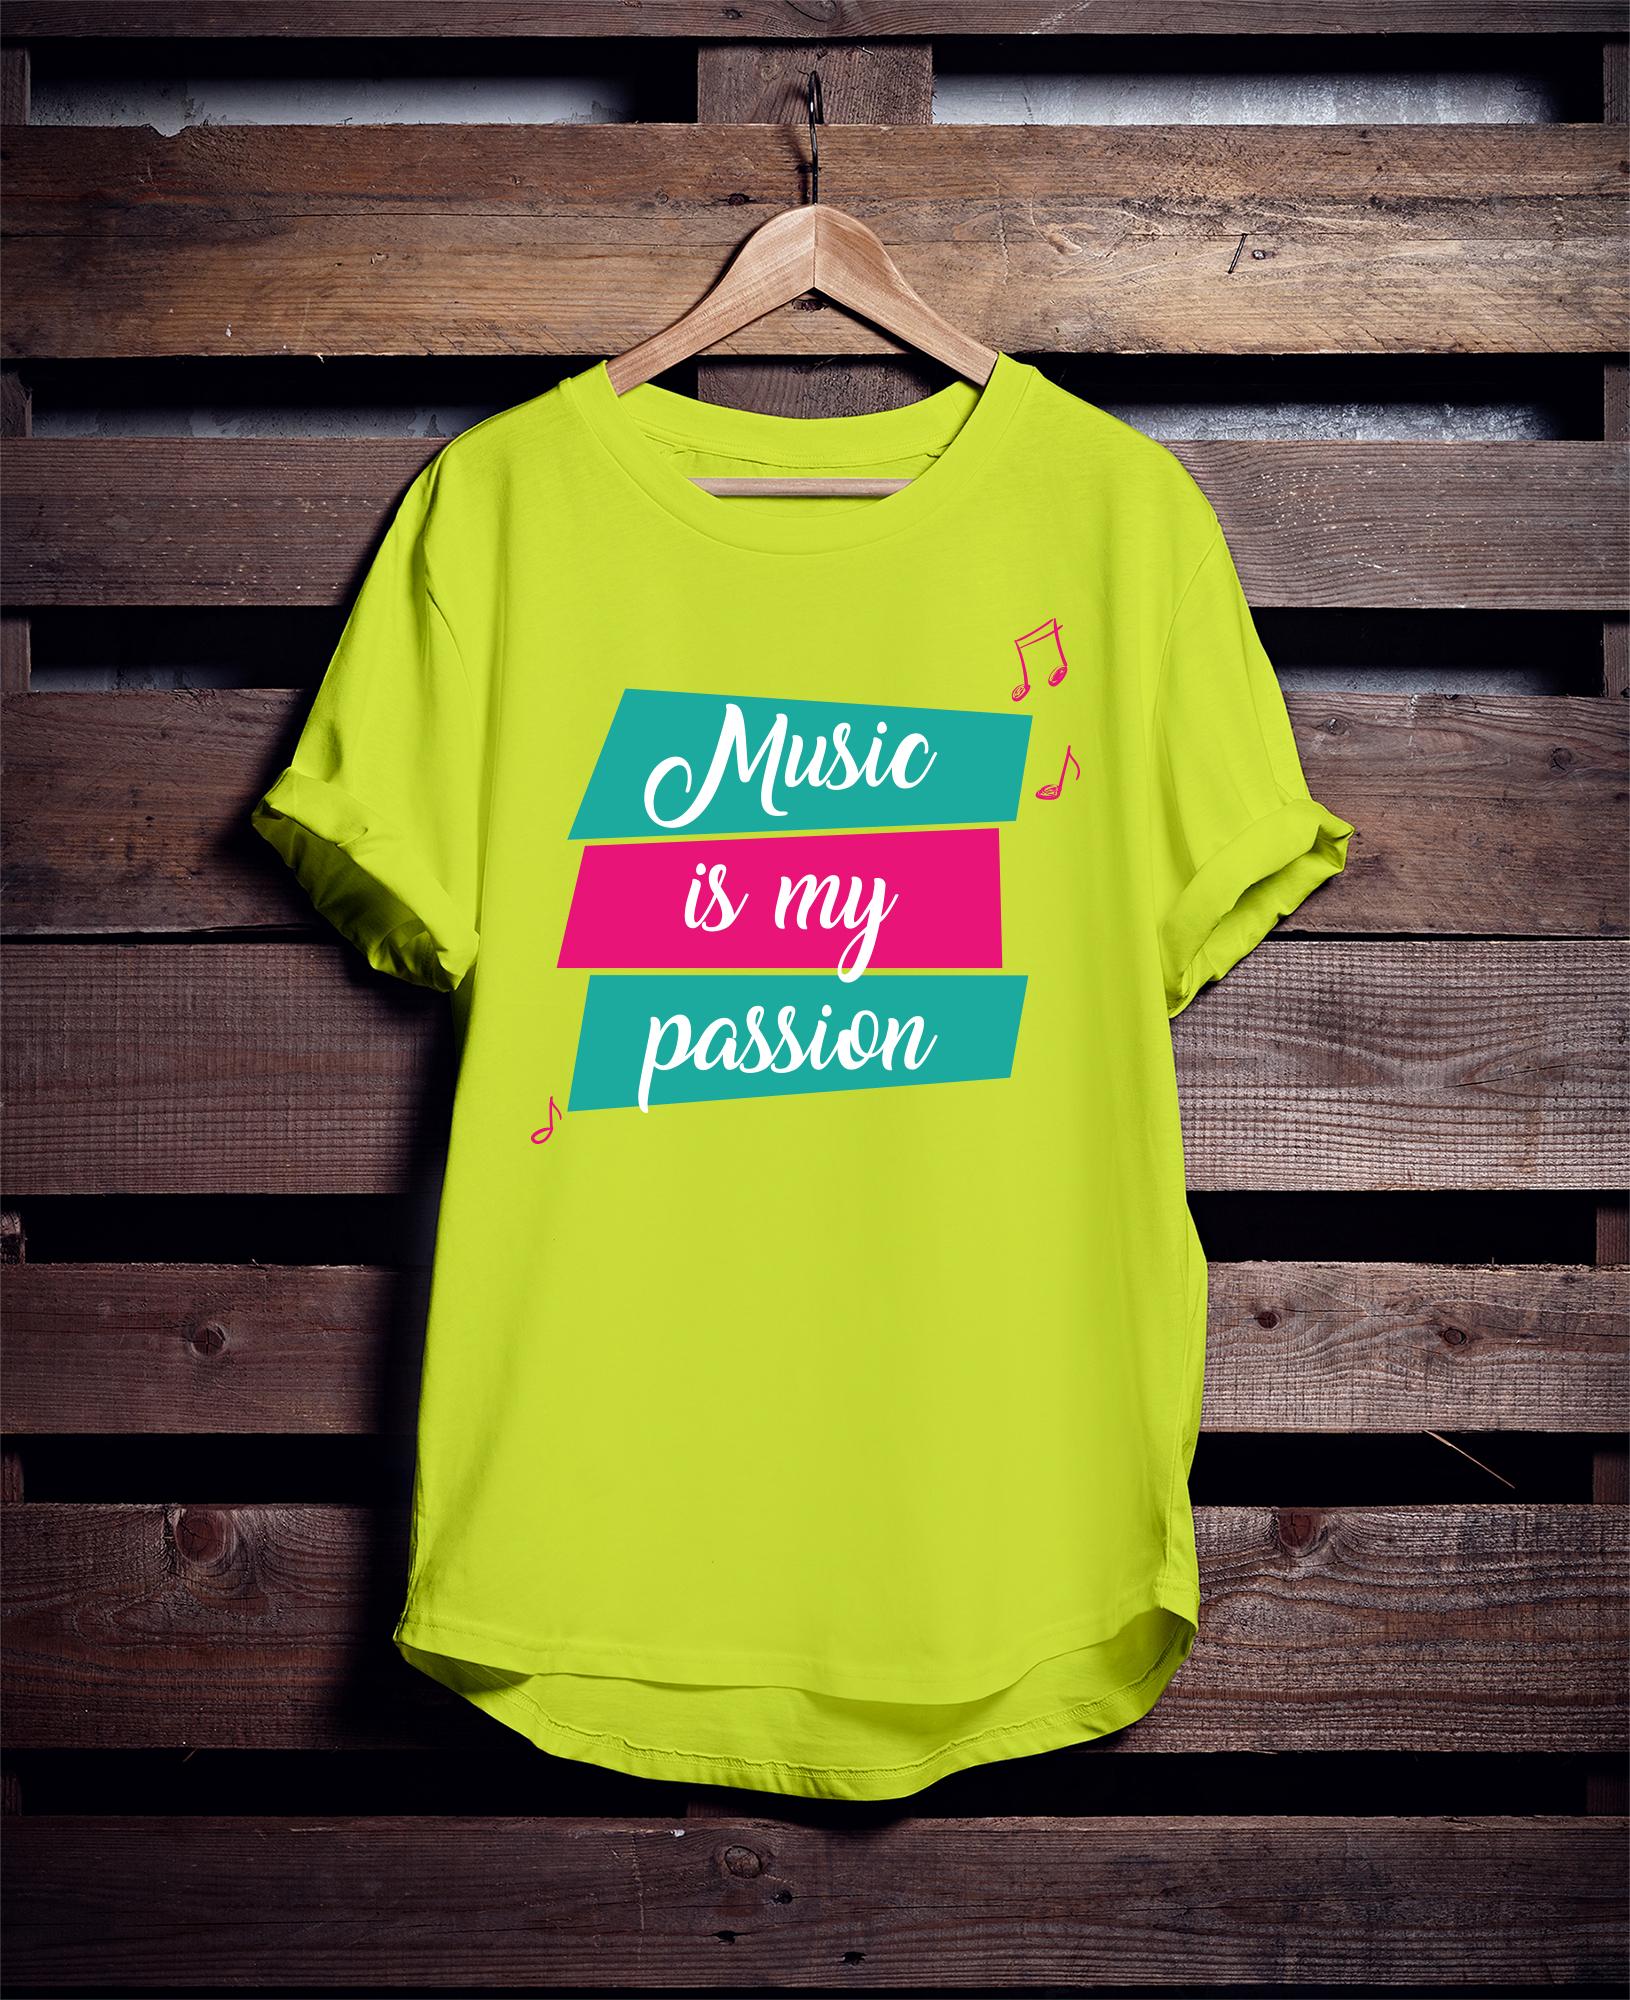 дизайн для футболки ( music)